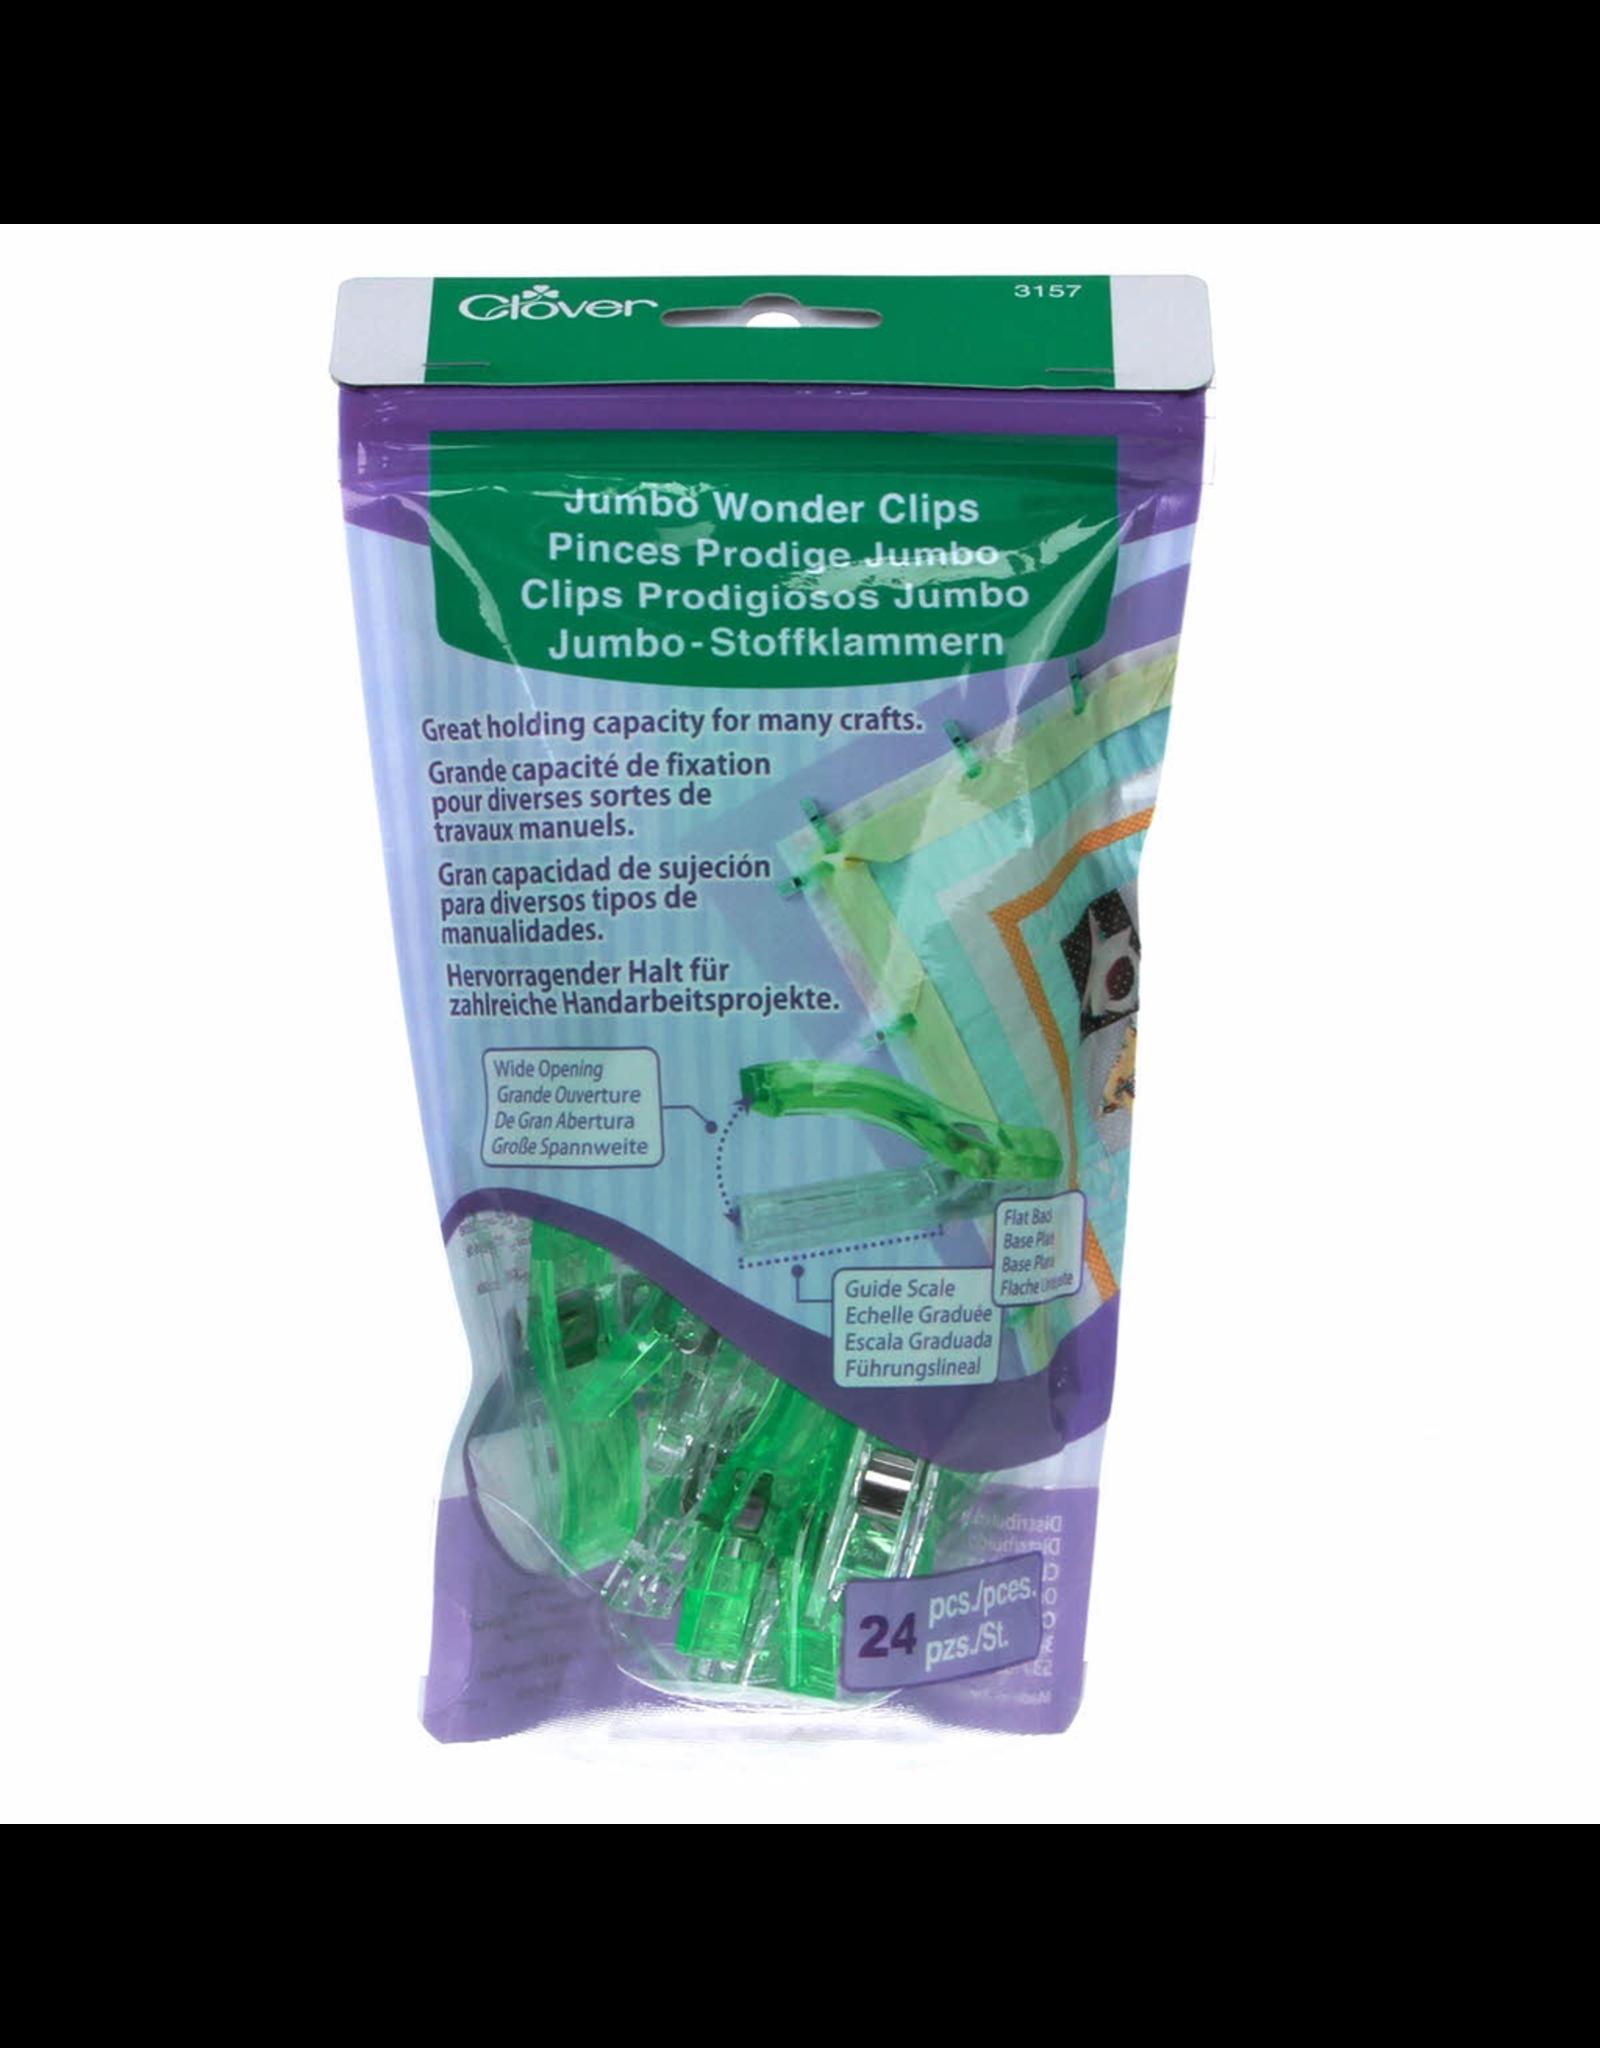 Clover Jumbo Wonder Clips in Green 24 pc